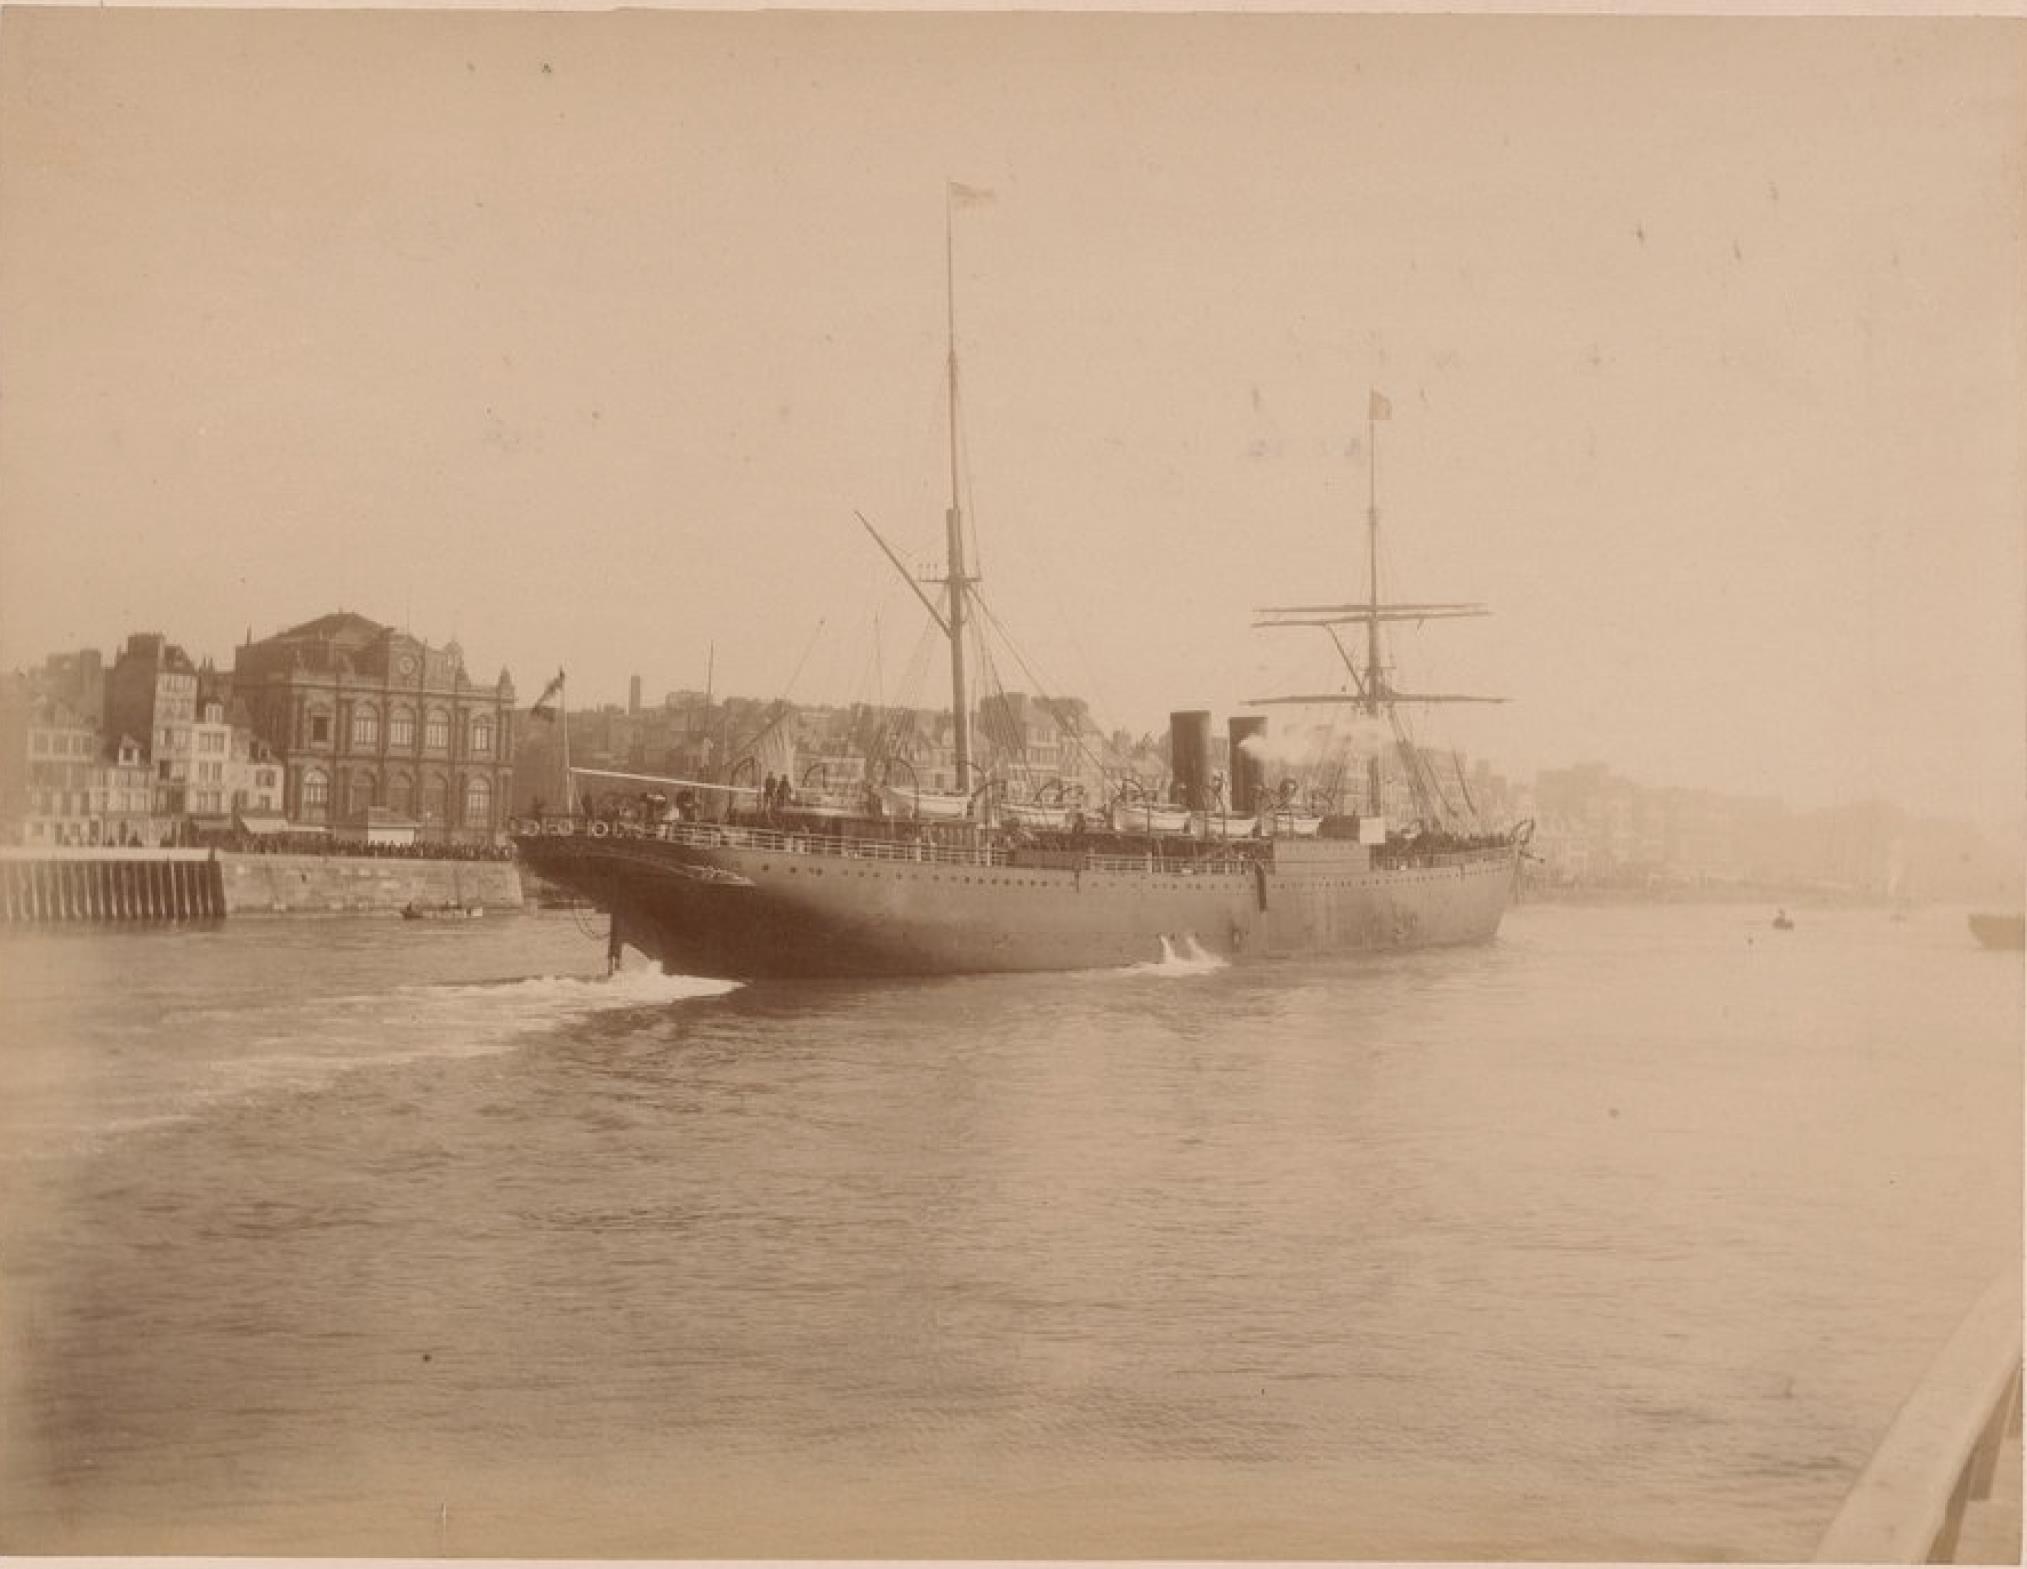 Пассажирское судно «Силезия». Линии Гамбург-Гавр, Гамбург - Нью-Йорк